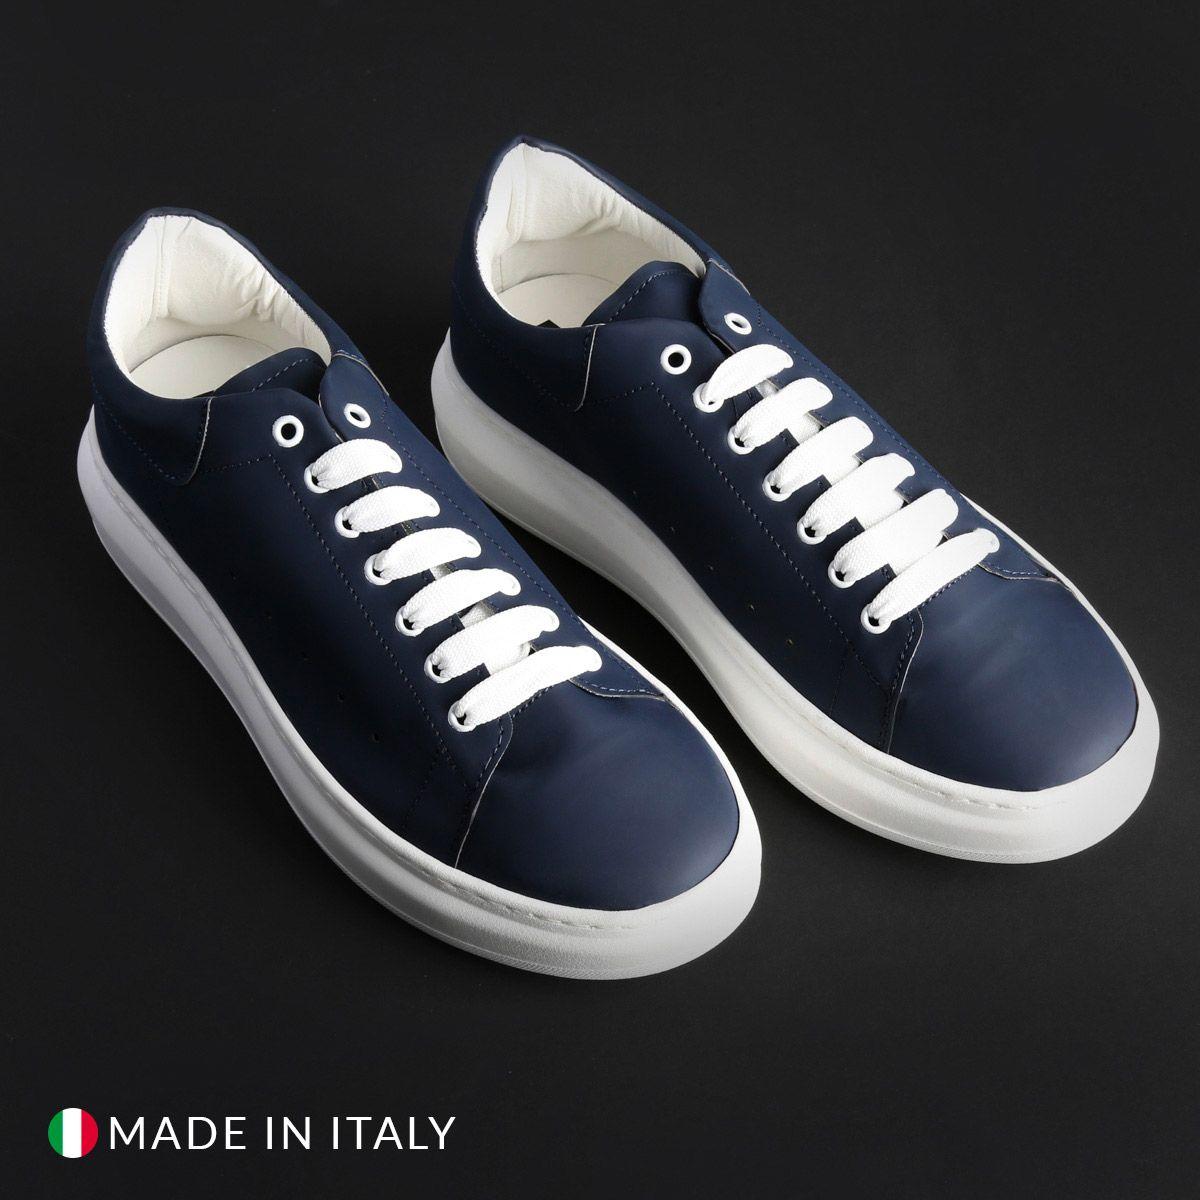 Chaussures SB 3012 – 1001_CRUST